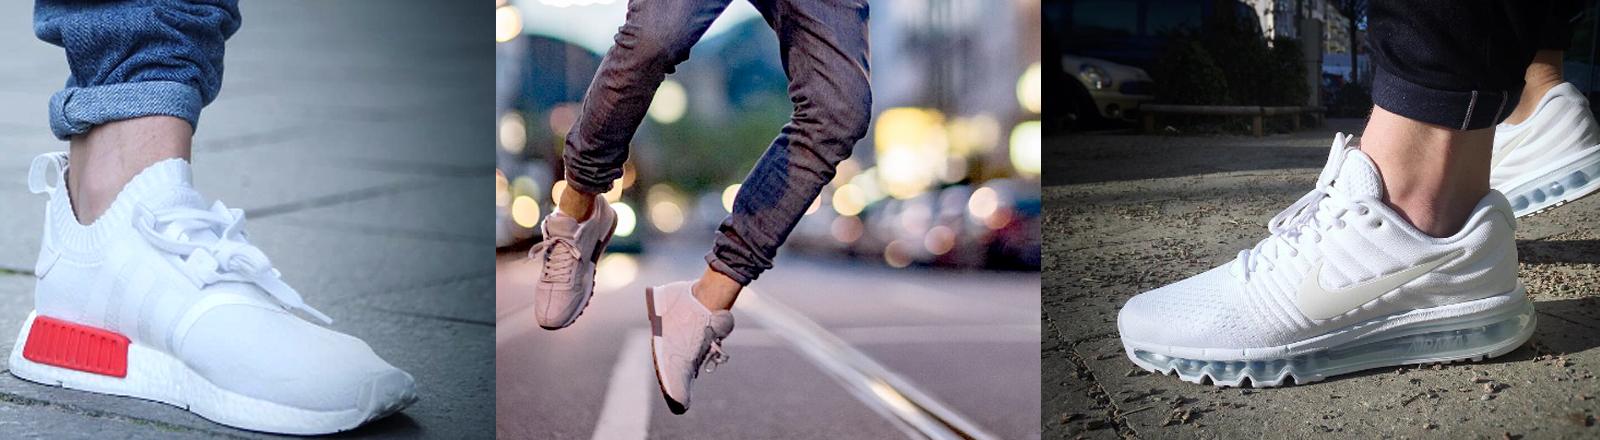 Turnschuhe ohne Socken